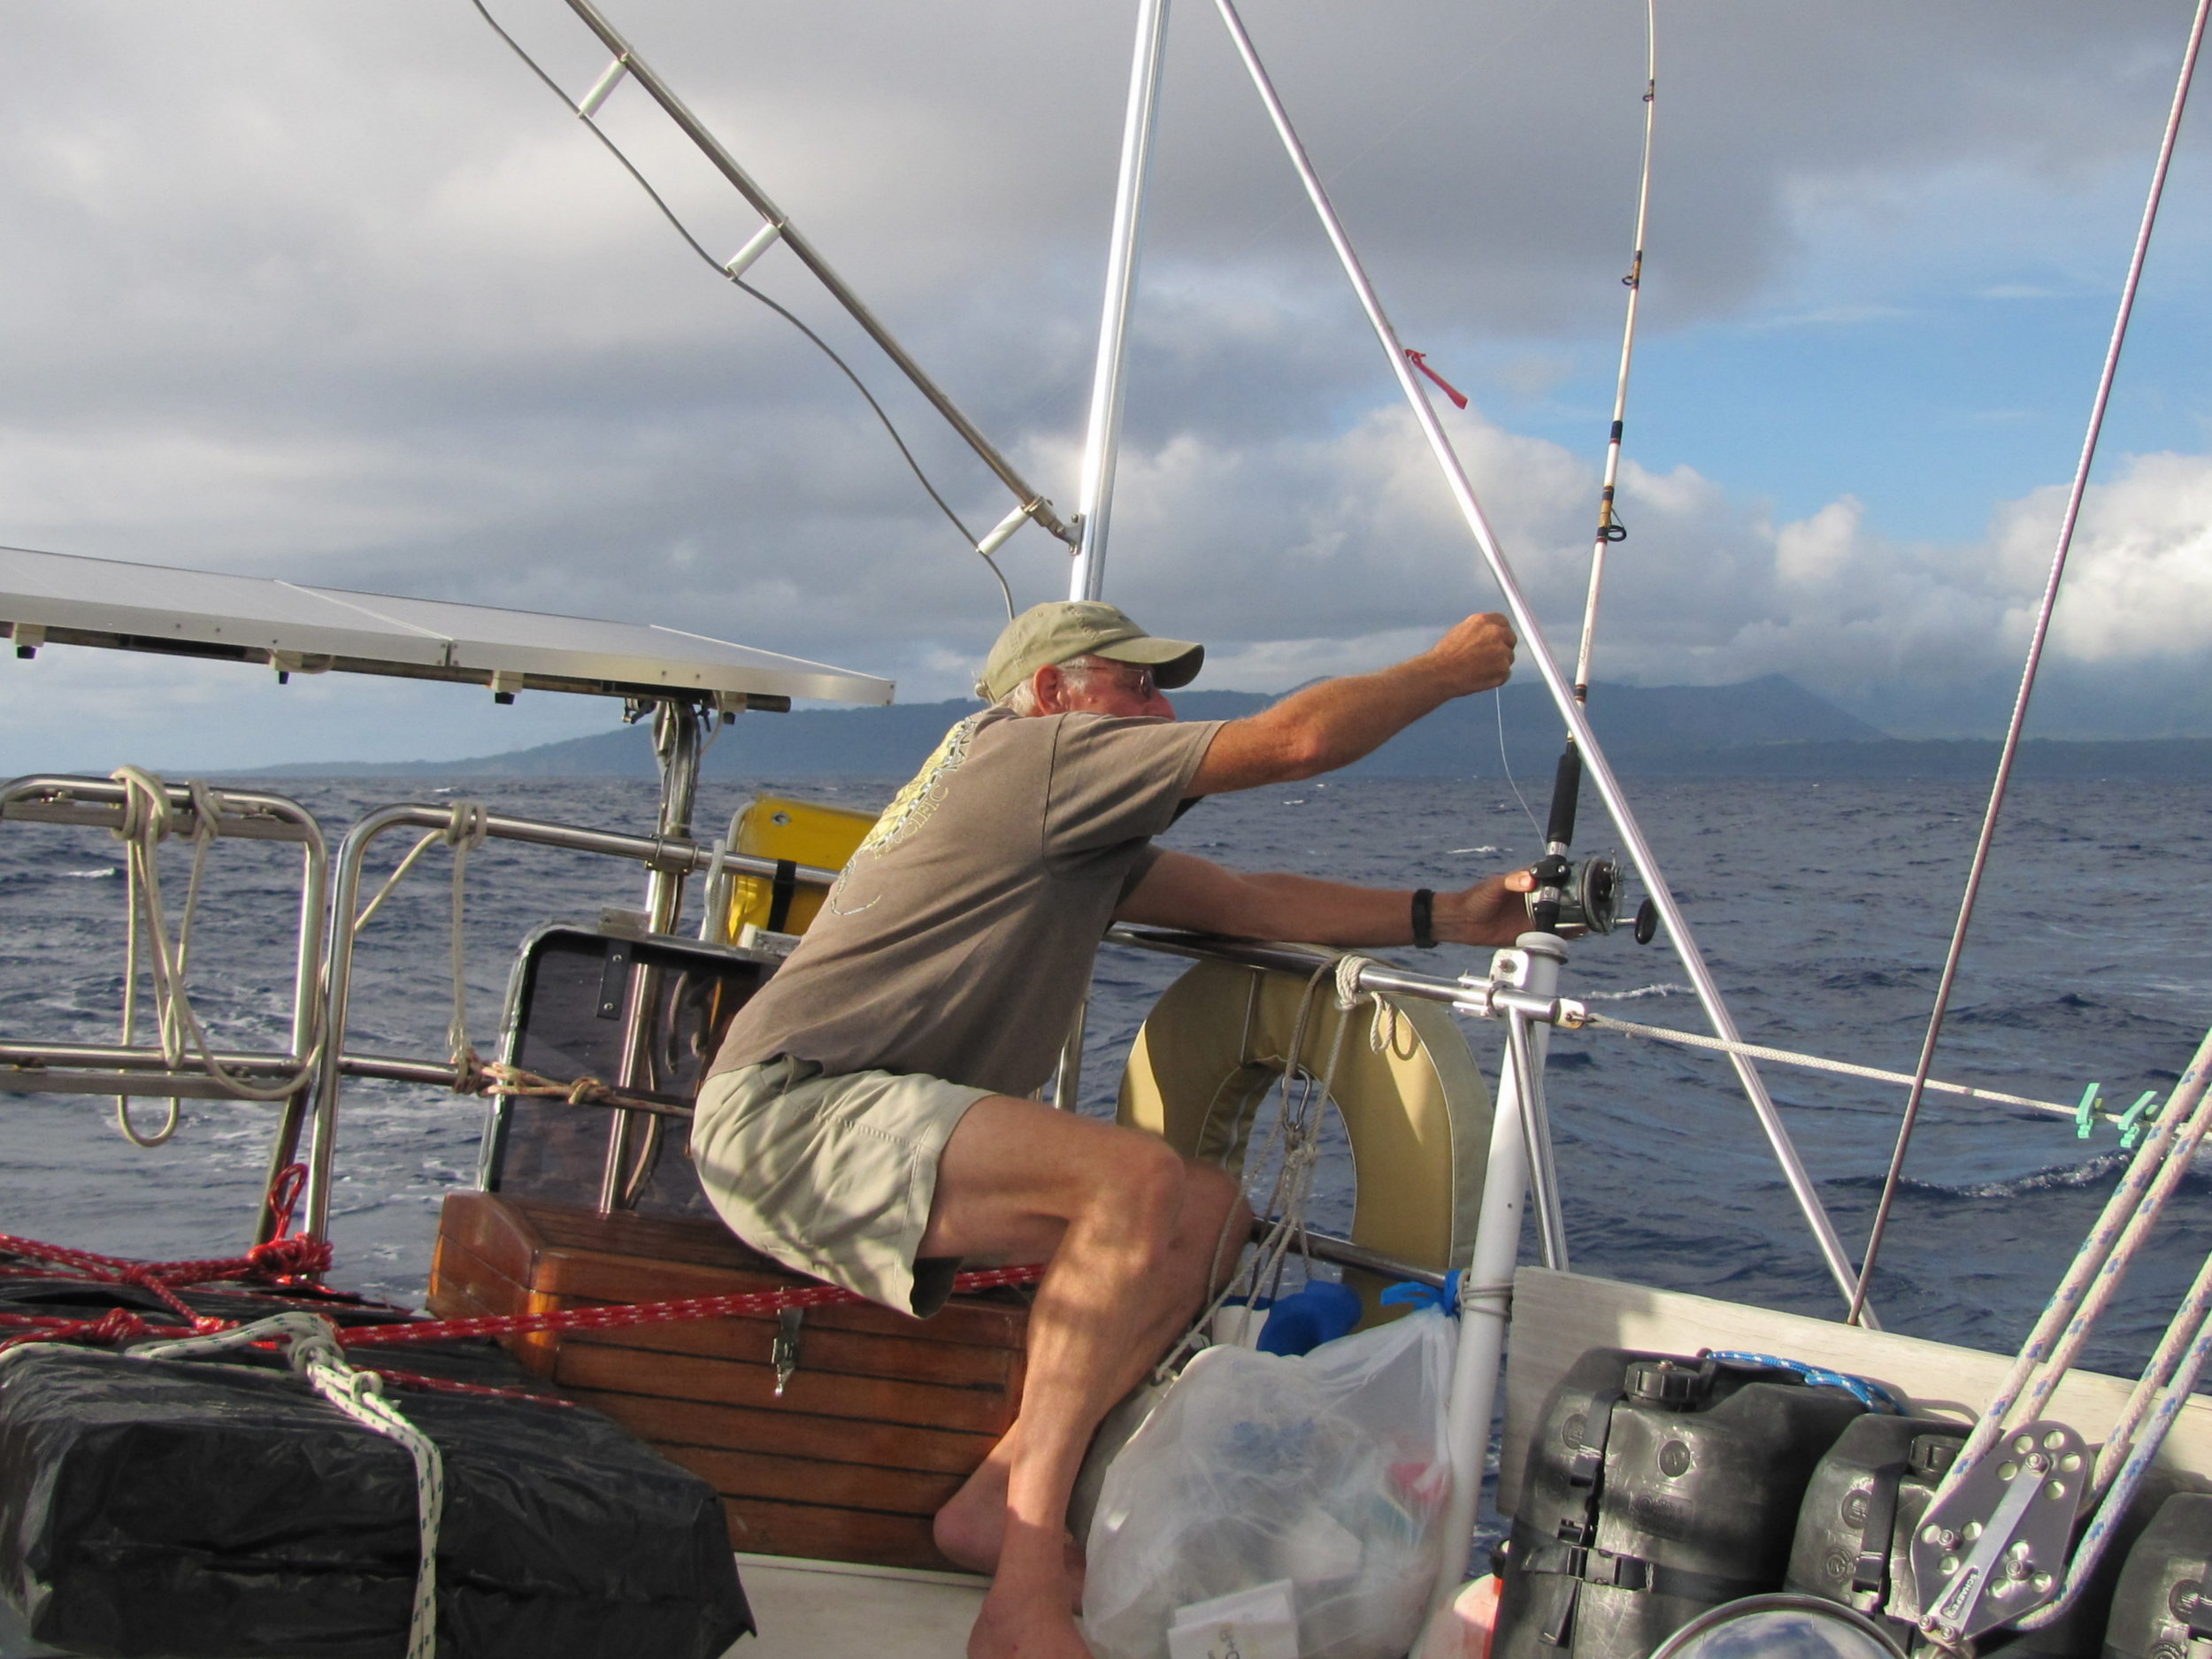 Letting out more line ... Erromango, Vanuatu